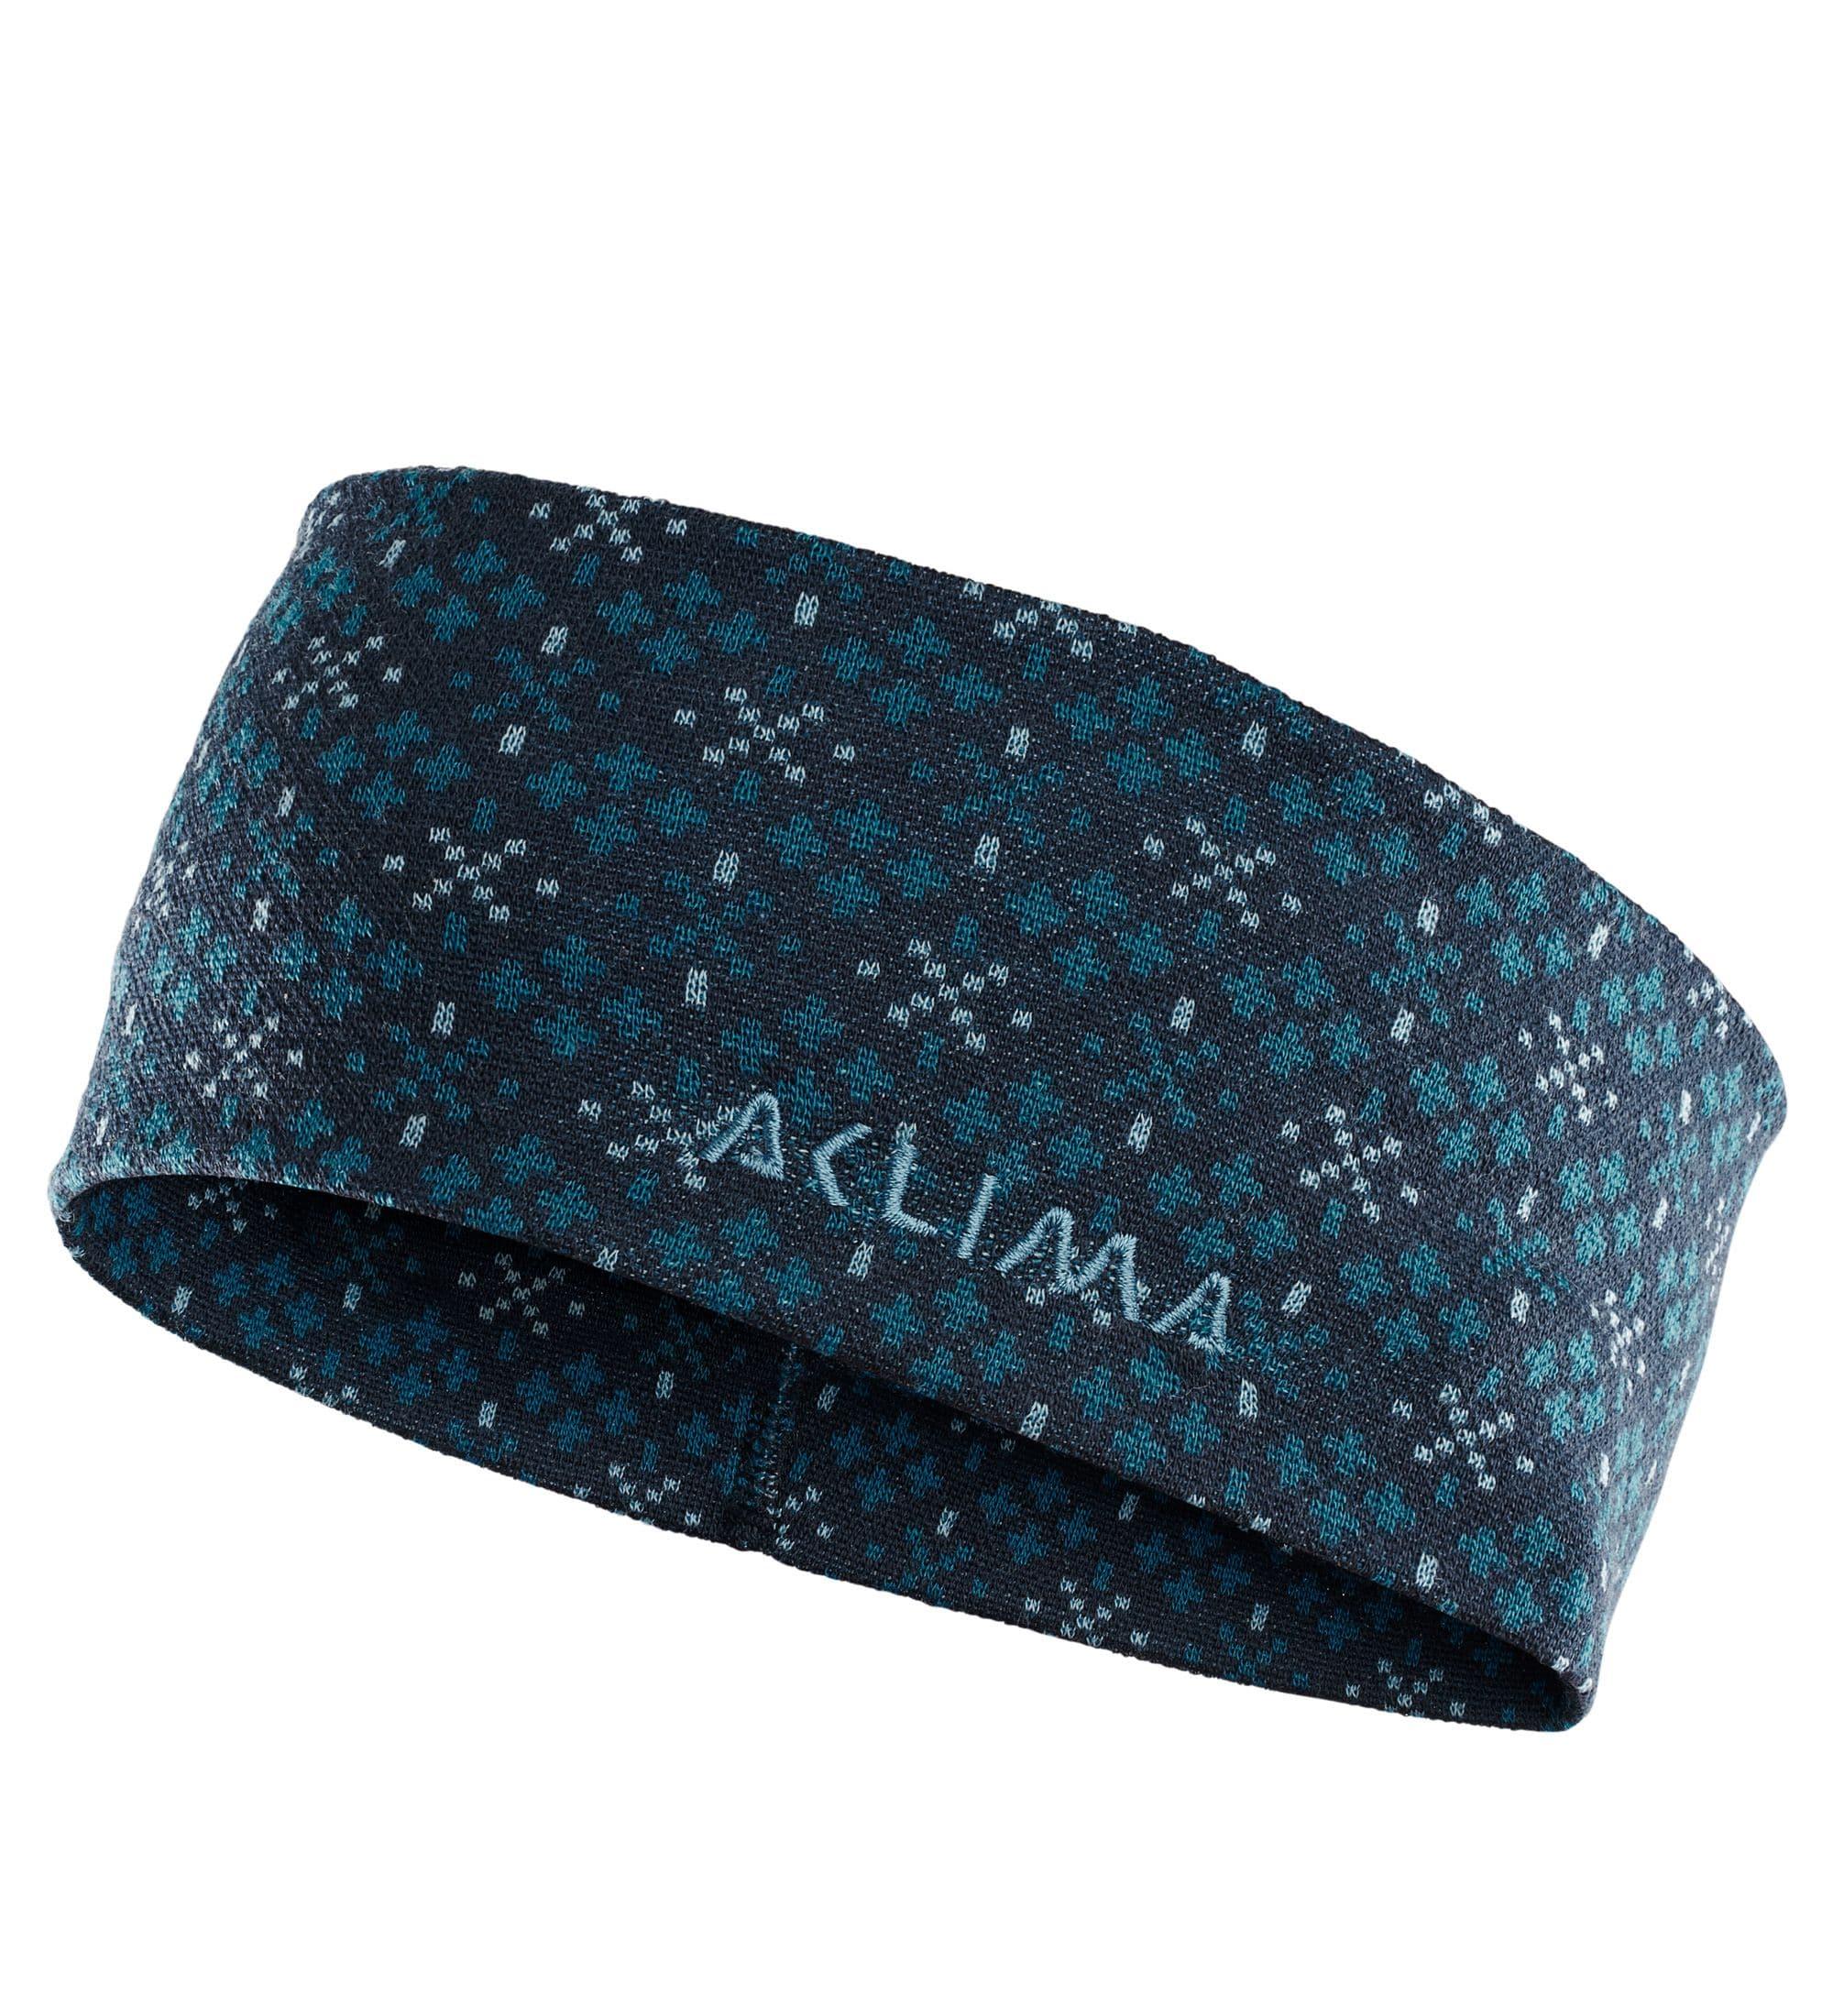 Aclima DesignWool Glitre headband